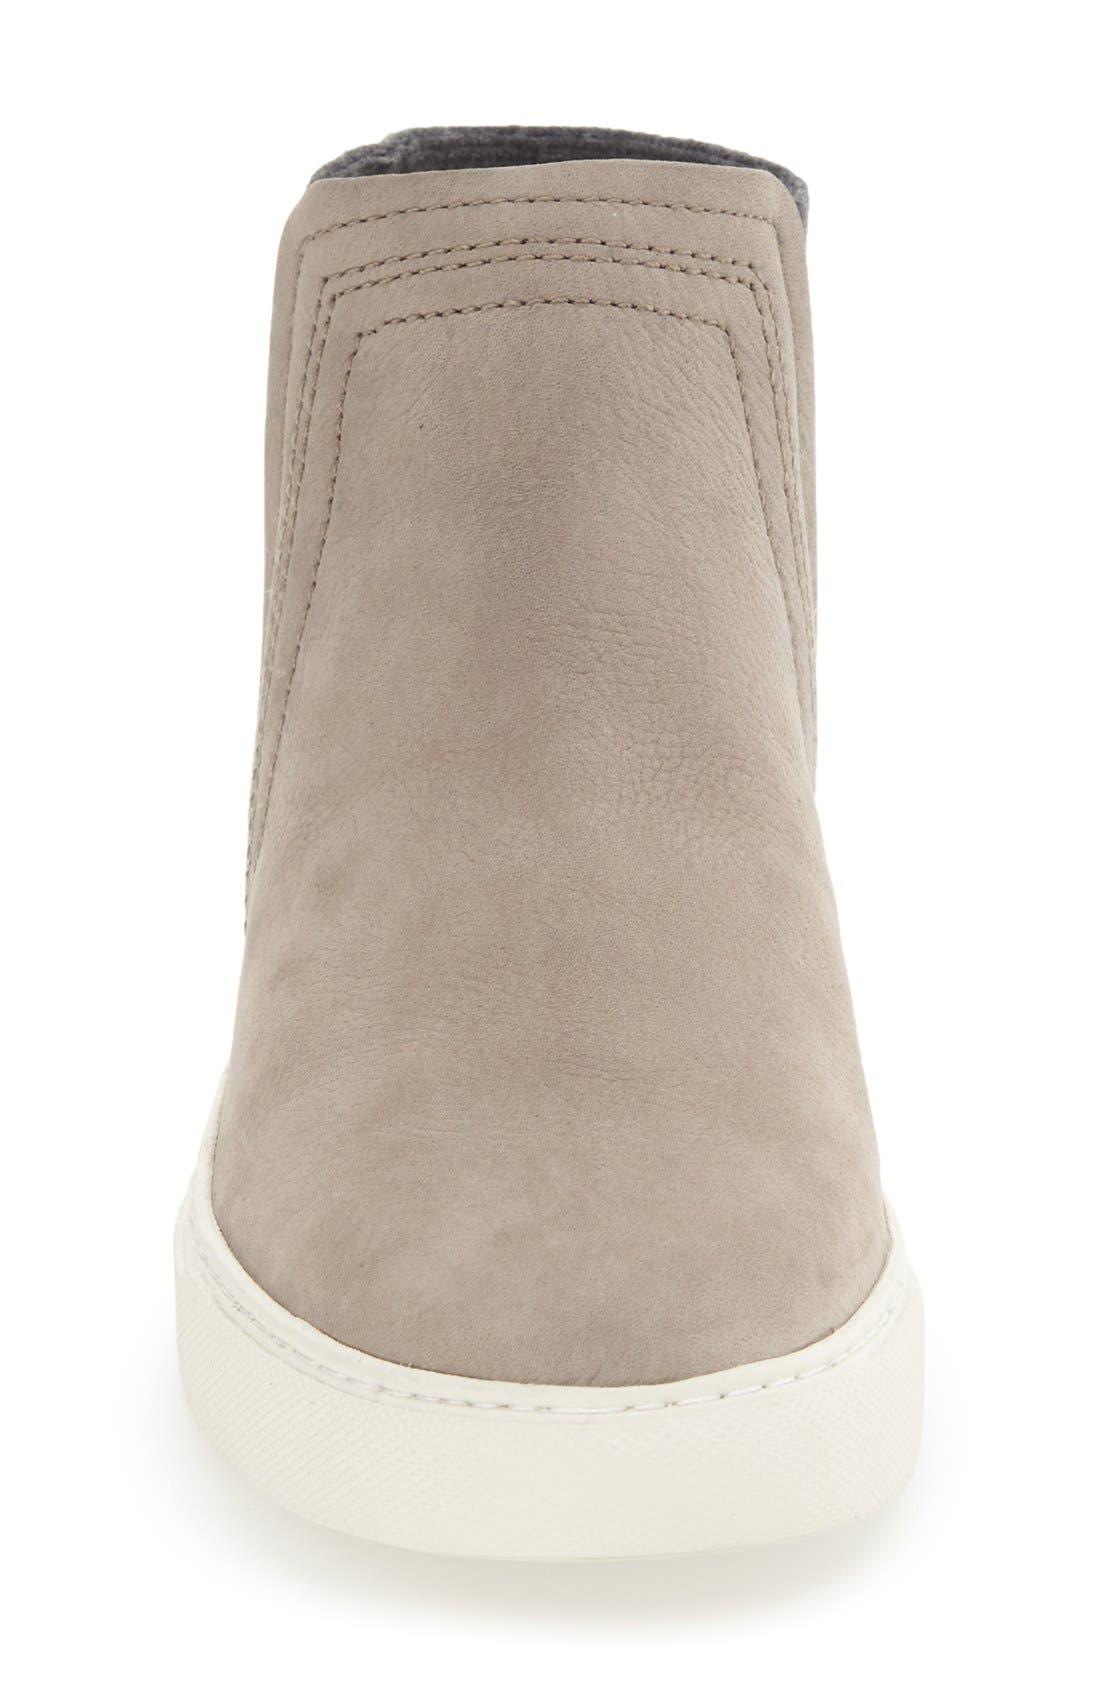 Alternate Image 3  - Kenneth Cole New York 'Ken' Leather Slip-On Sneaker (Women)